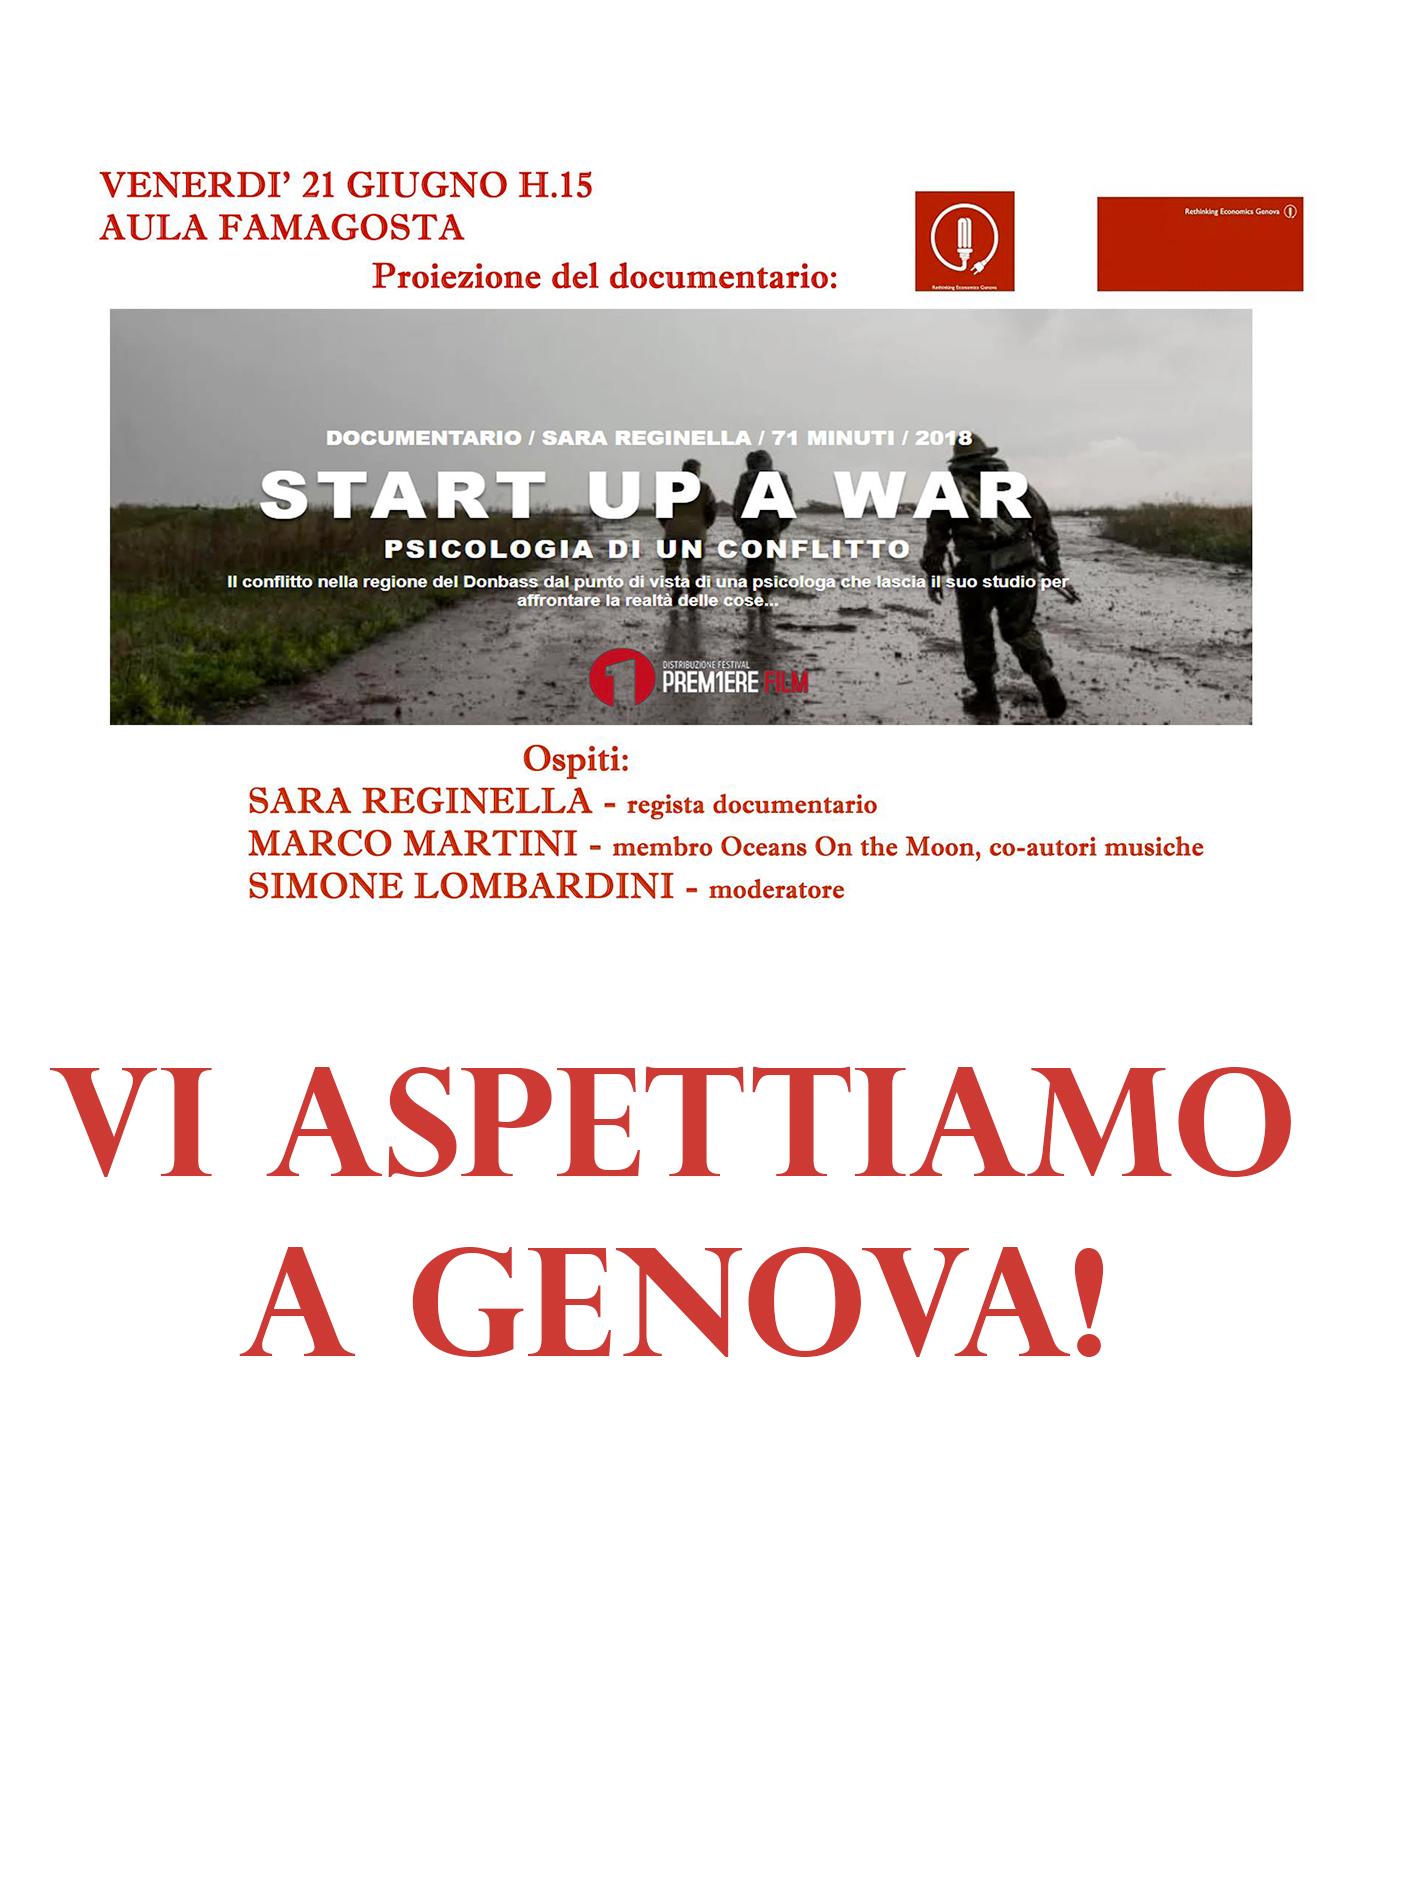 Sara Reginella   Start Up a War Proiezione Documentario Aula Famagosta Genova